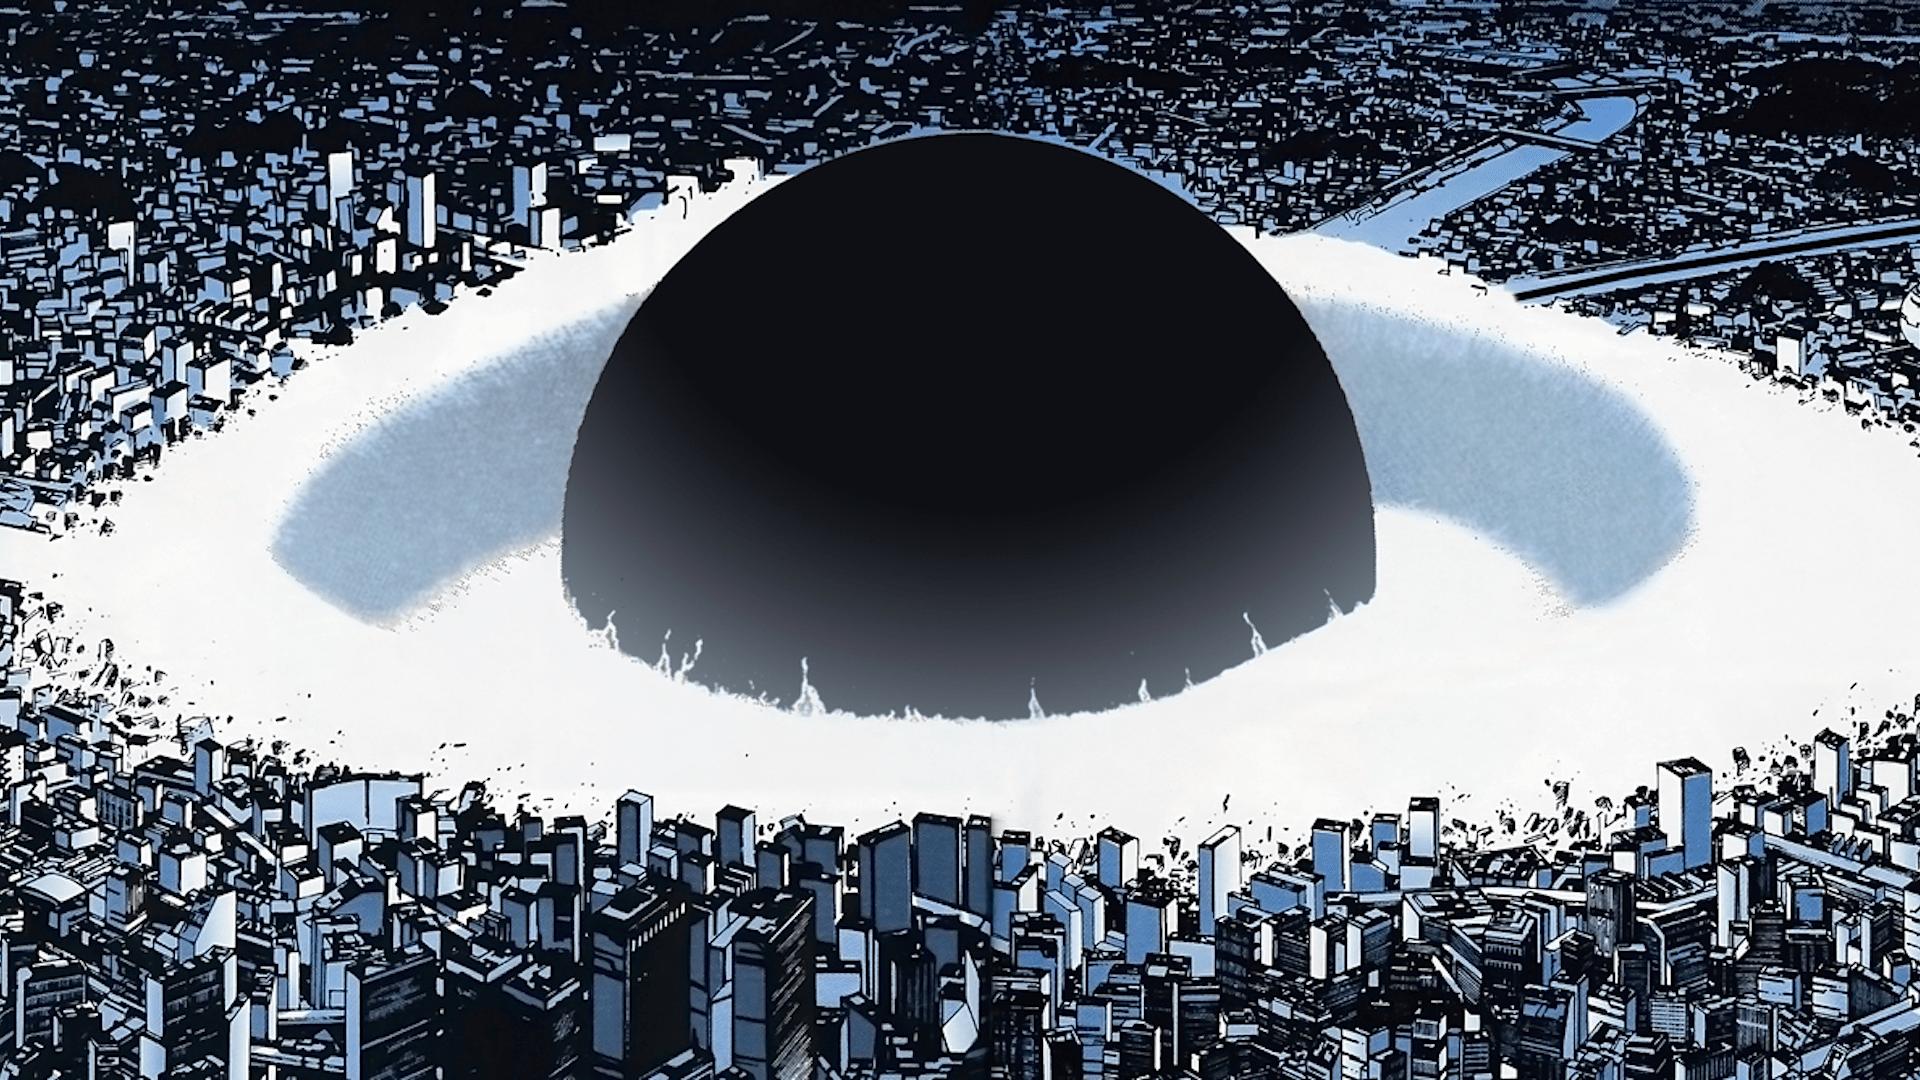 1920x1080 Akira Explosion Hd Wallpaper Akira Ghost In The Shell Cyberpunk Anime